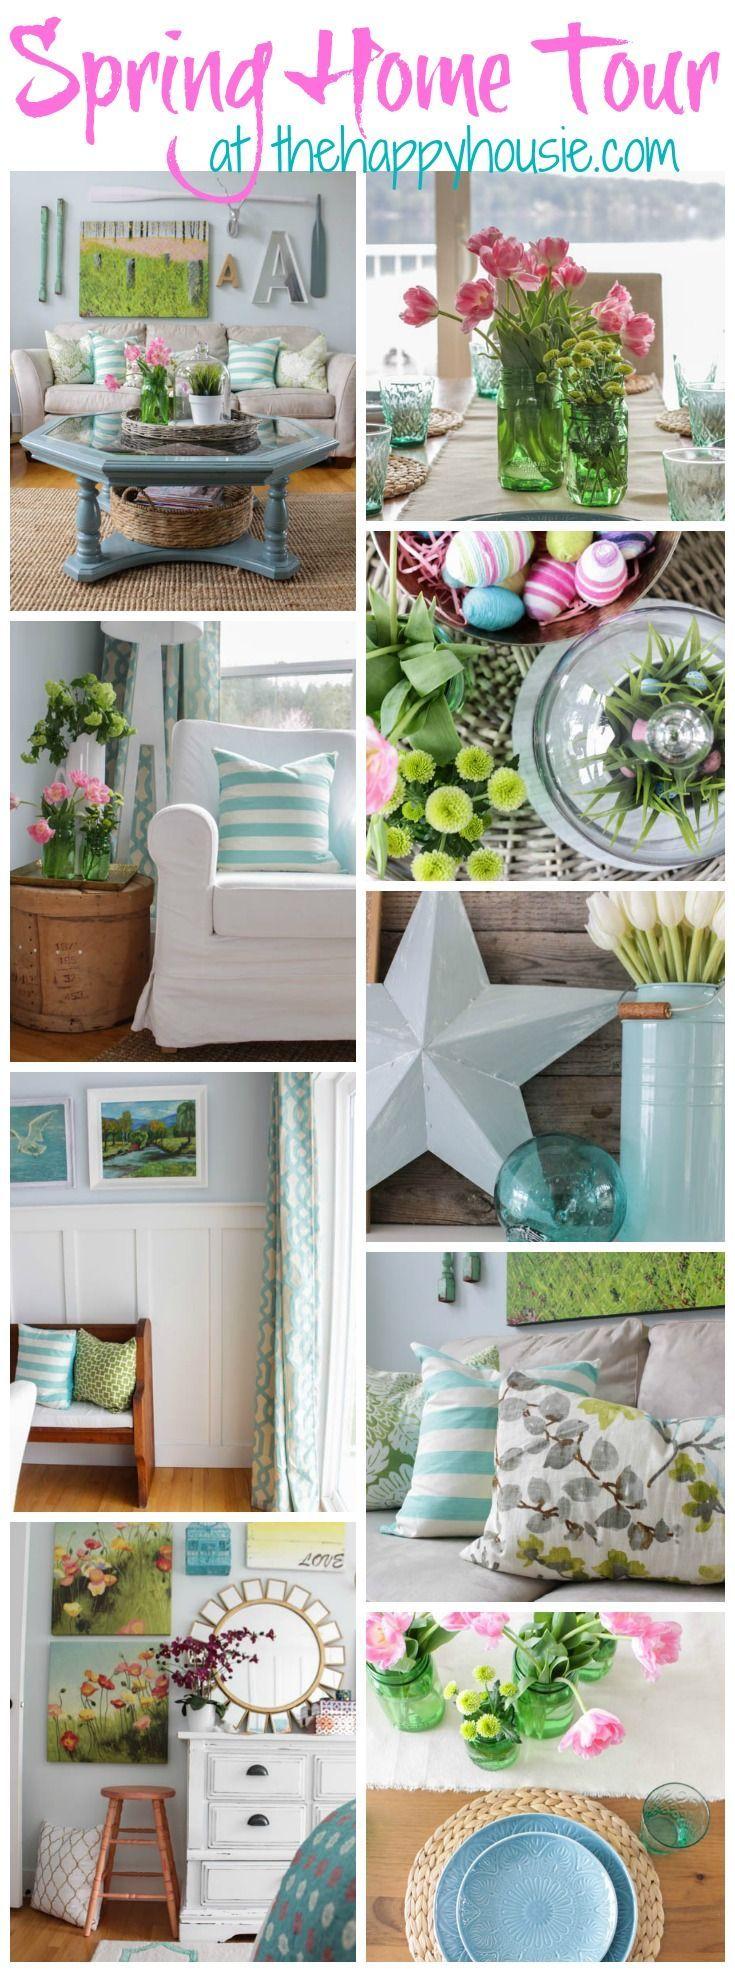 17 best images about farmhouse decor ideas on pinterest. Black Bedroom Furniture Sets. Home Design Ideas